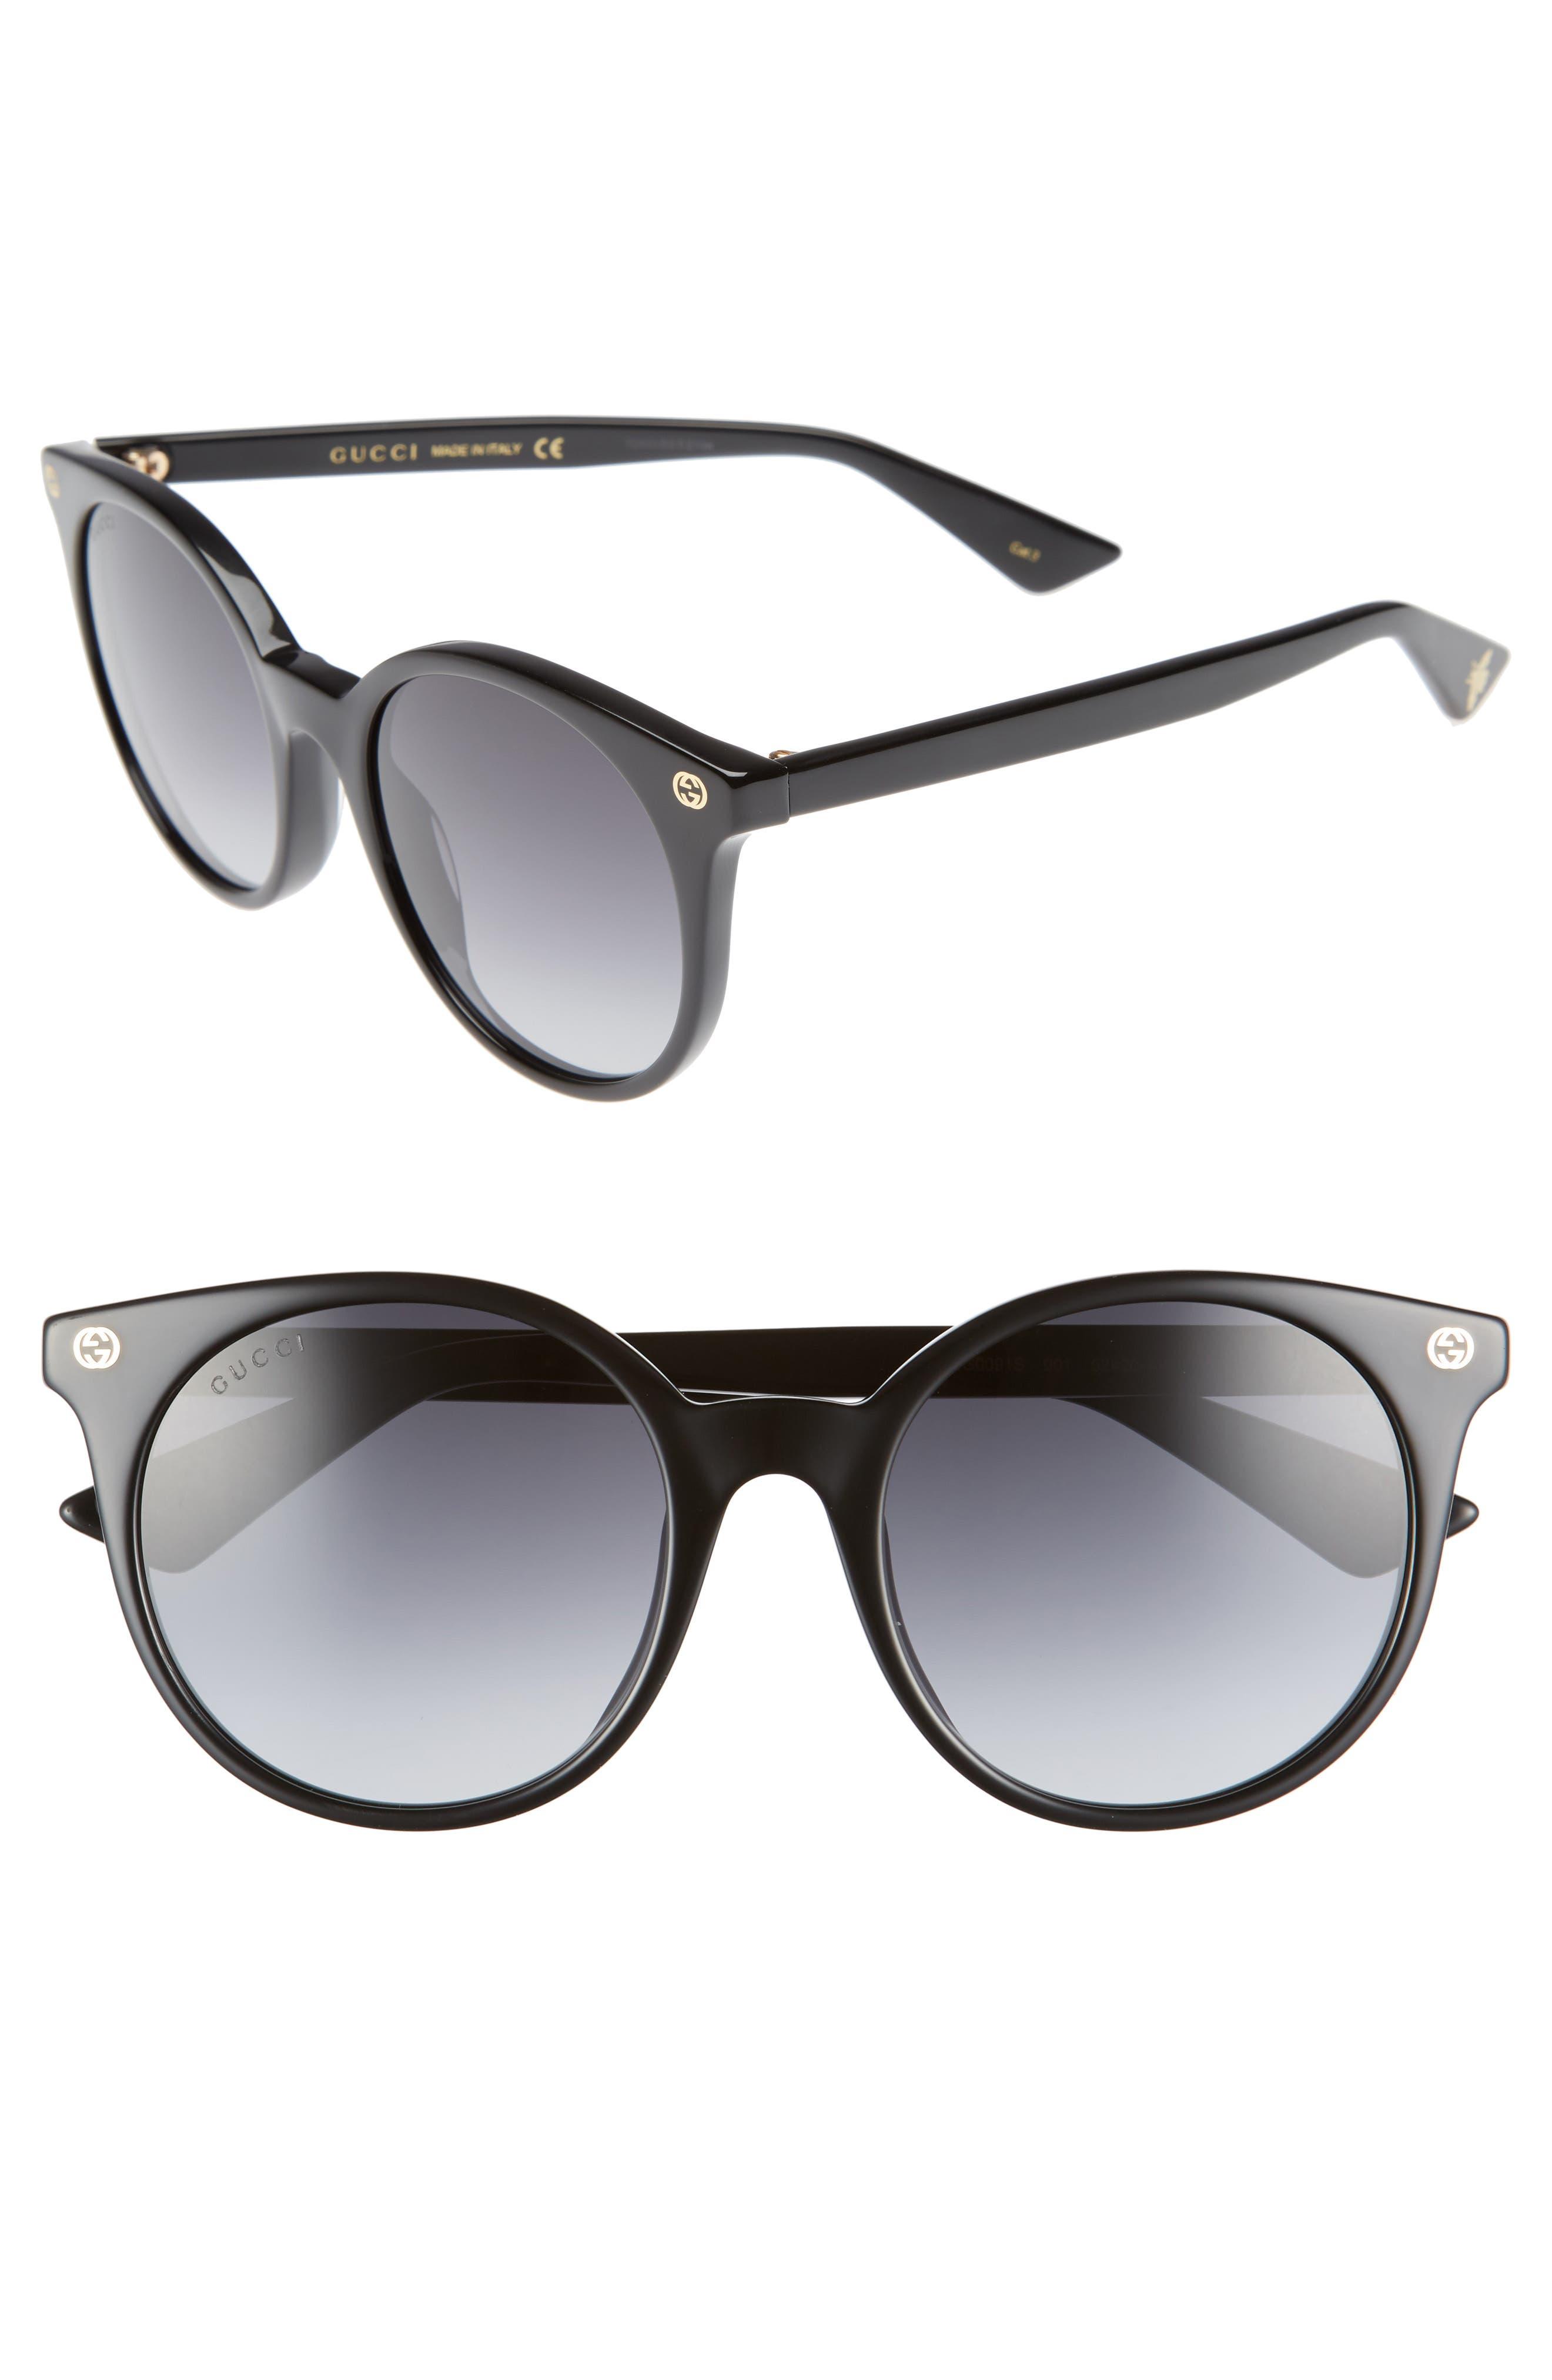 52mm Round Sunglasses,                         Main,                         color,